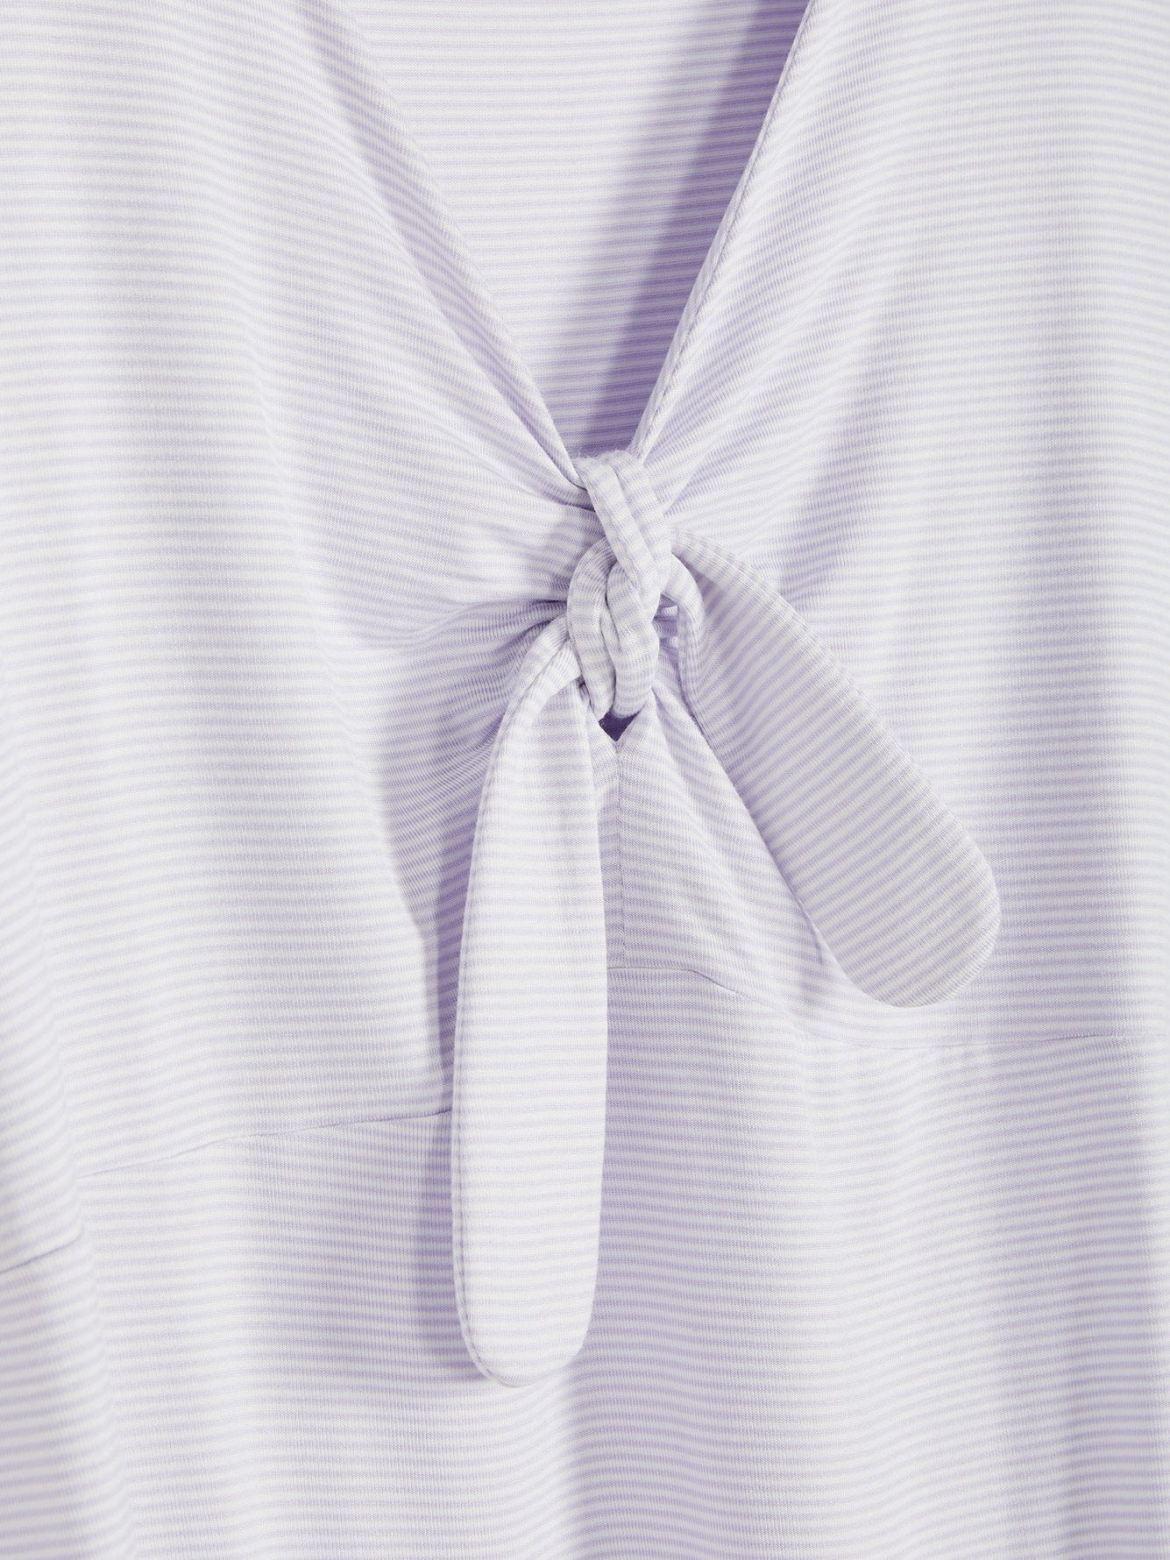 V-Neck Short Sleeve Swing T-Shirt - In Every Story